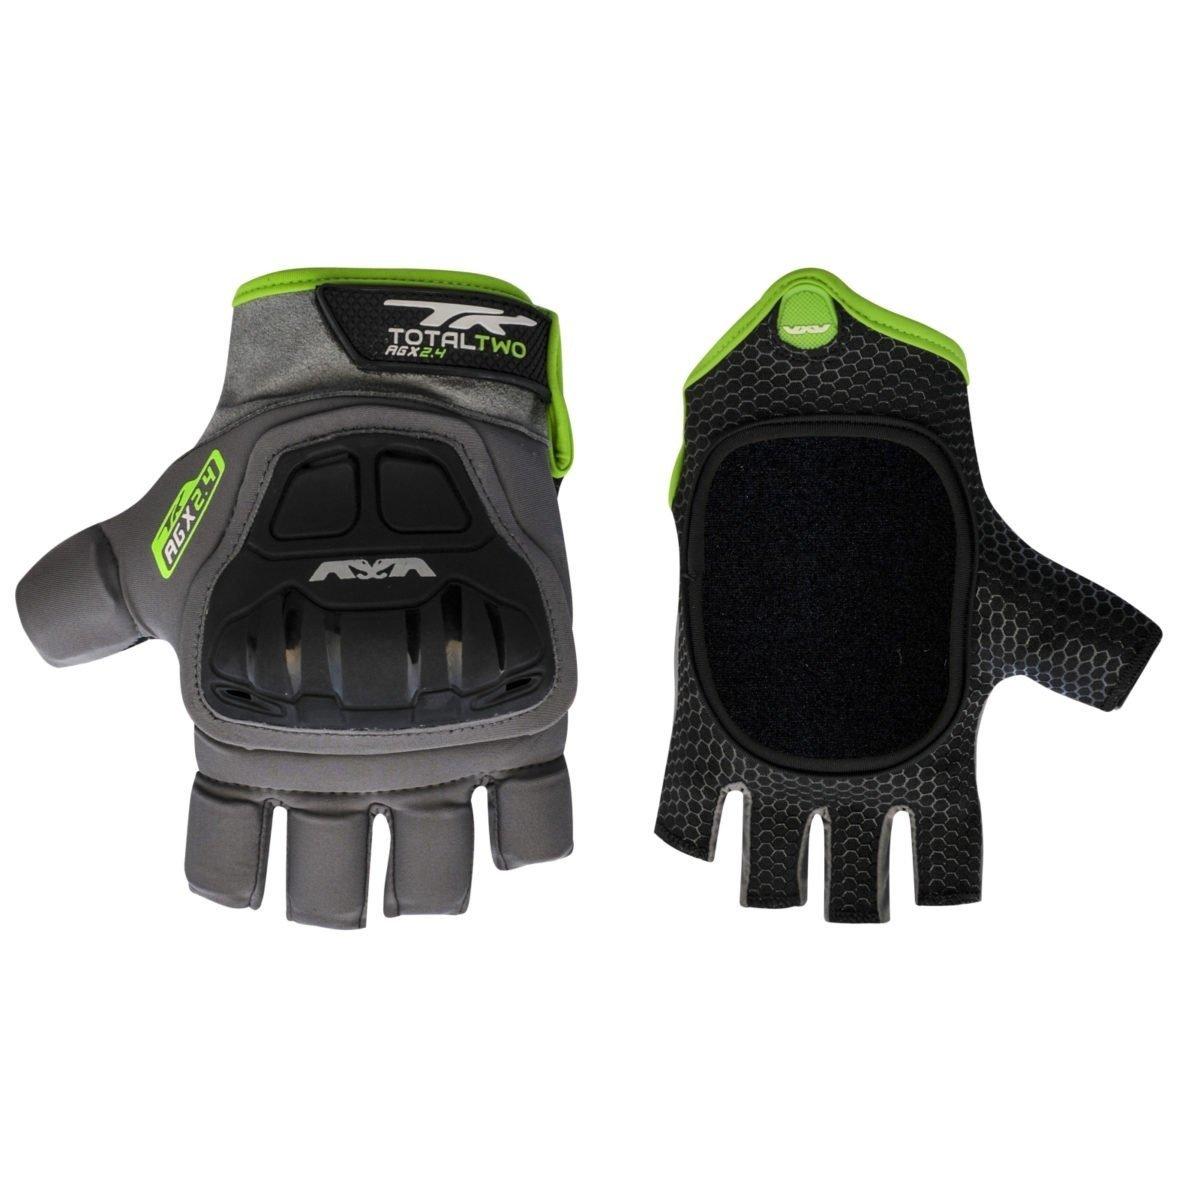 2017/18 TK Total One AGX 2.4 Hockey Glove with palm